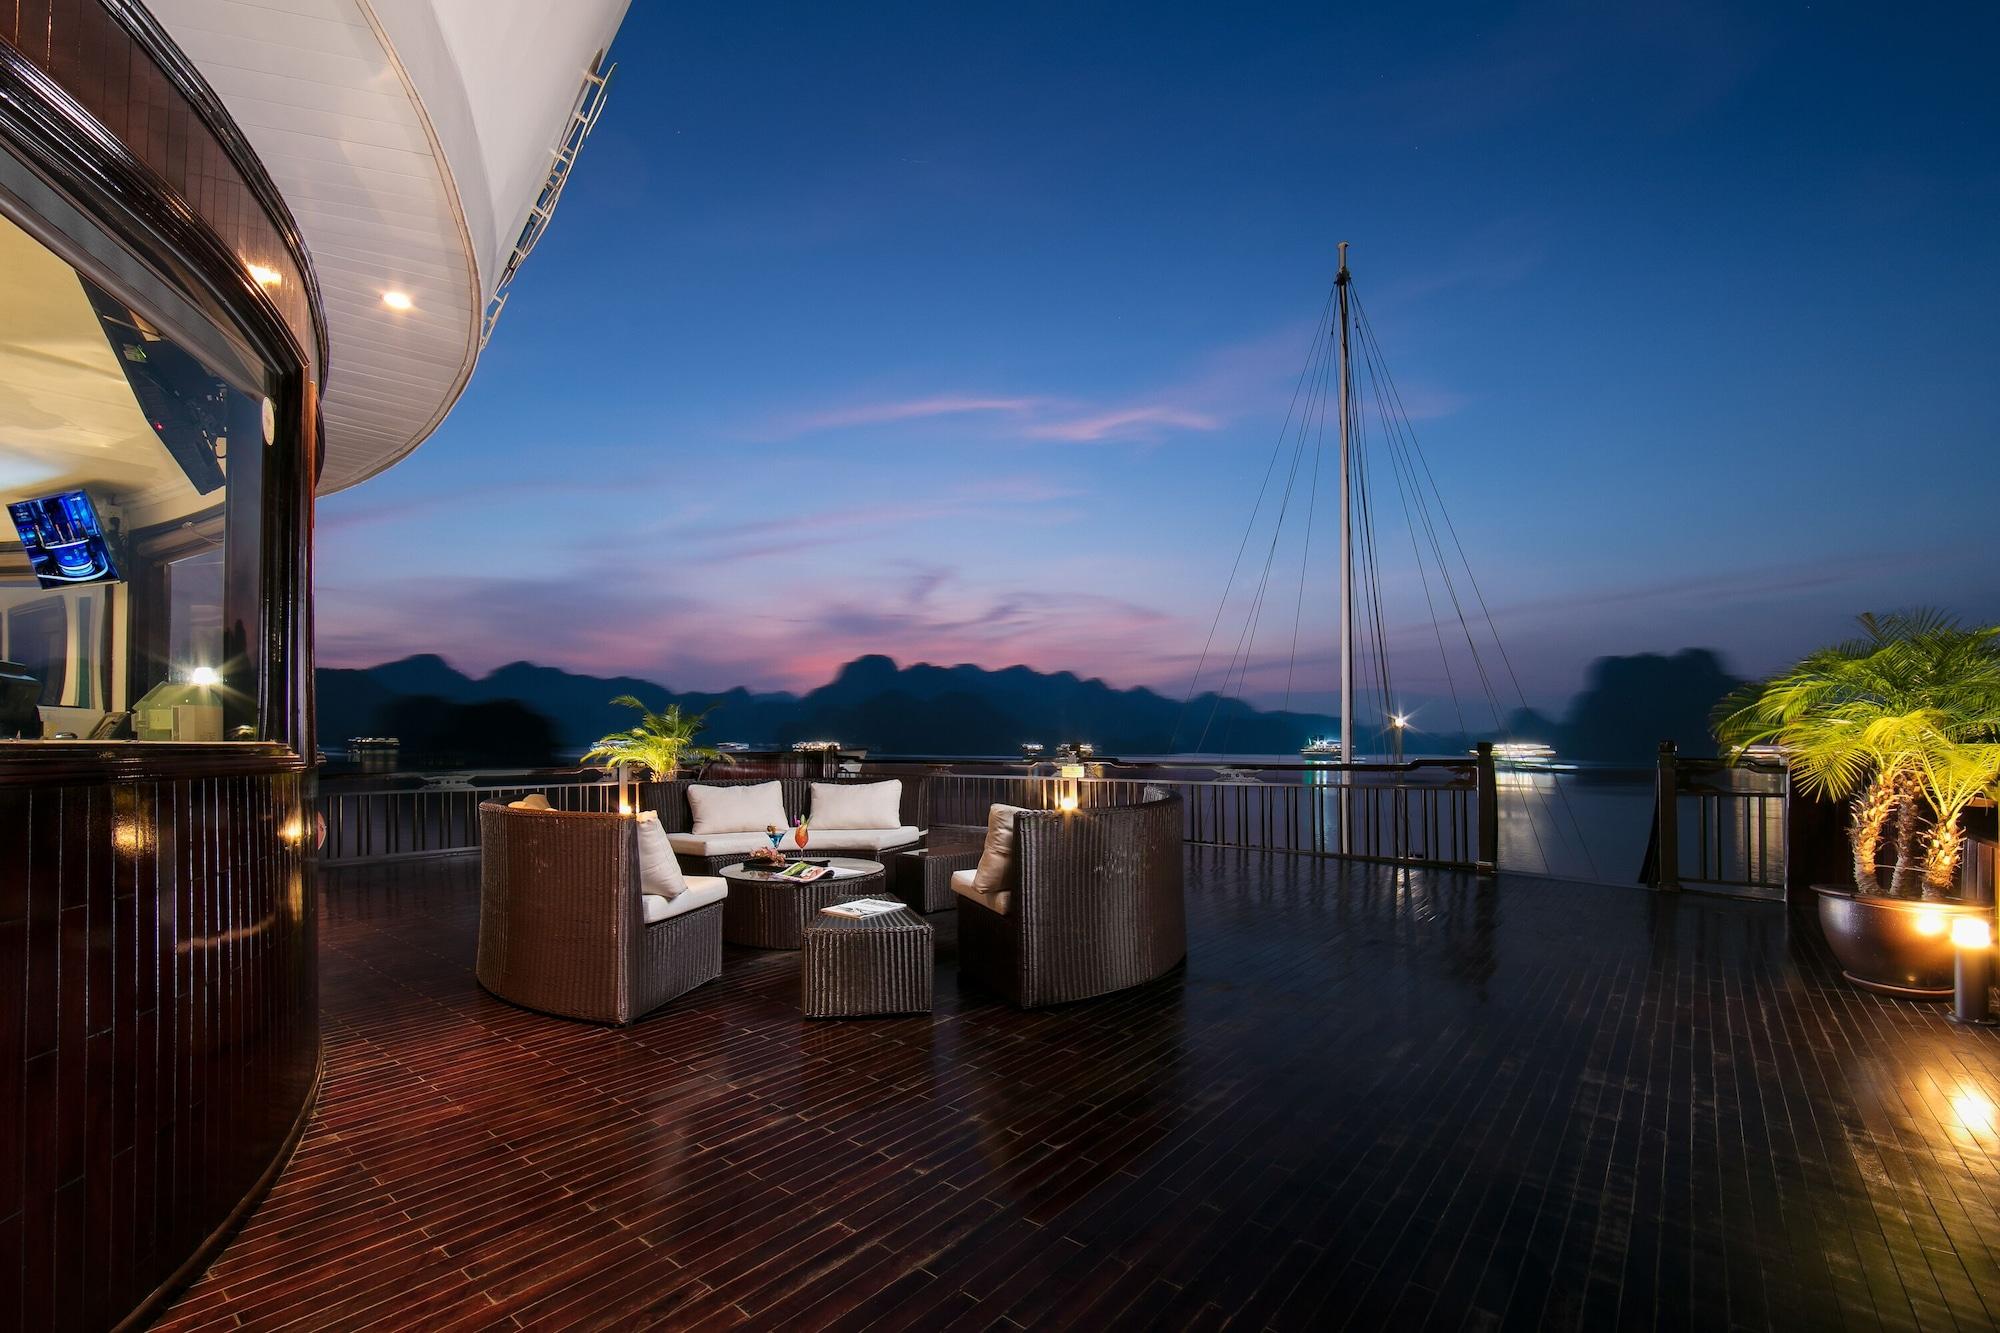 Genesis Regal Cruise, Hạ Long